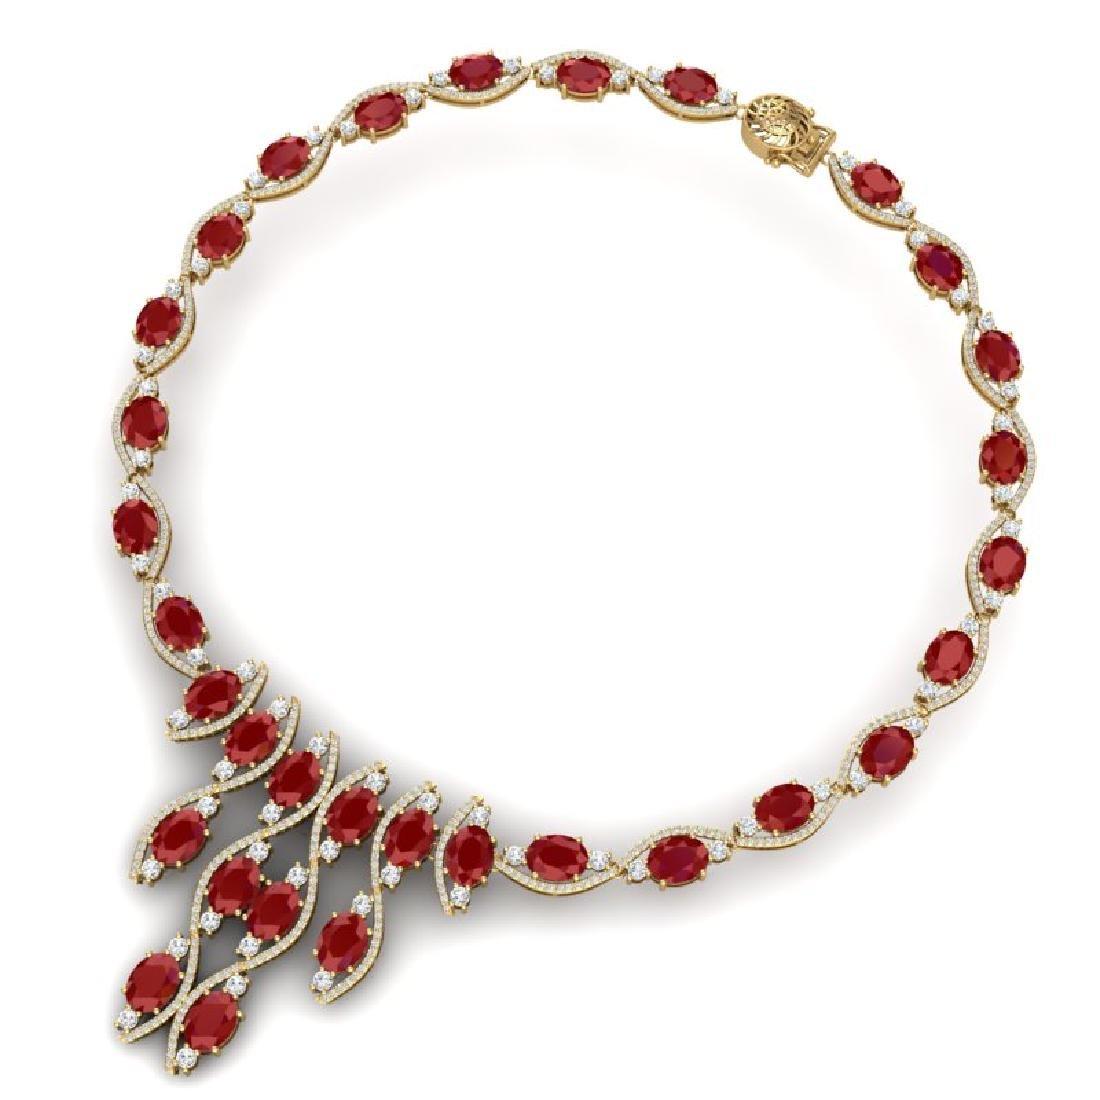 65.93 CTW Royalty Ruby & VS Diamond Necklace 18K Yellow - 3